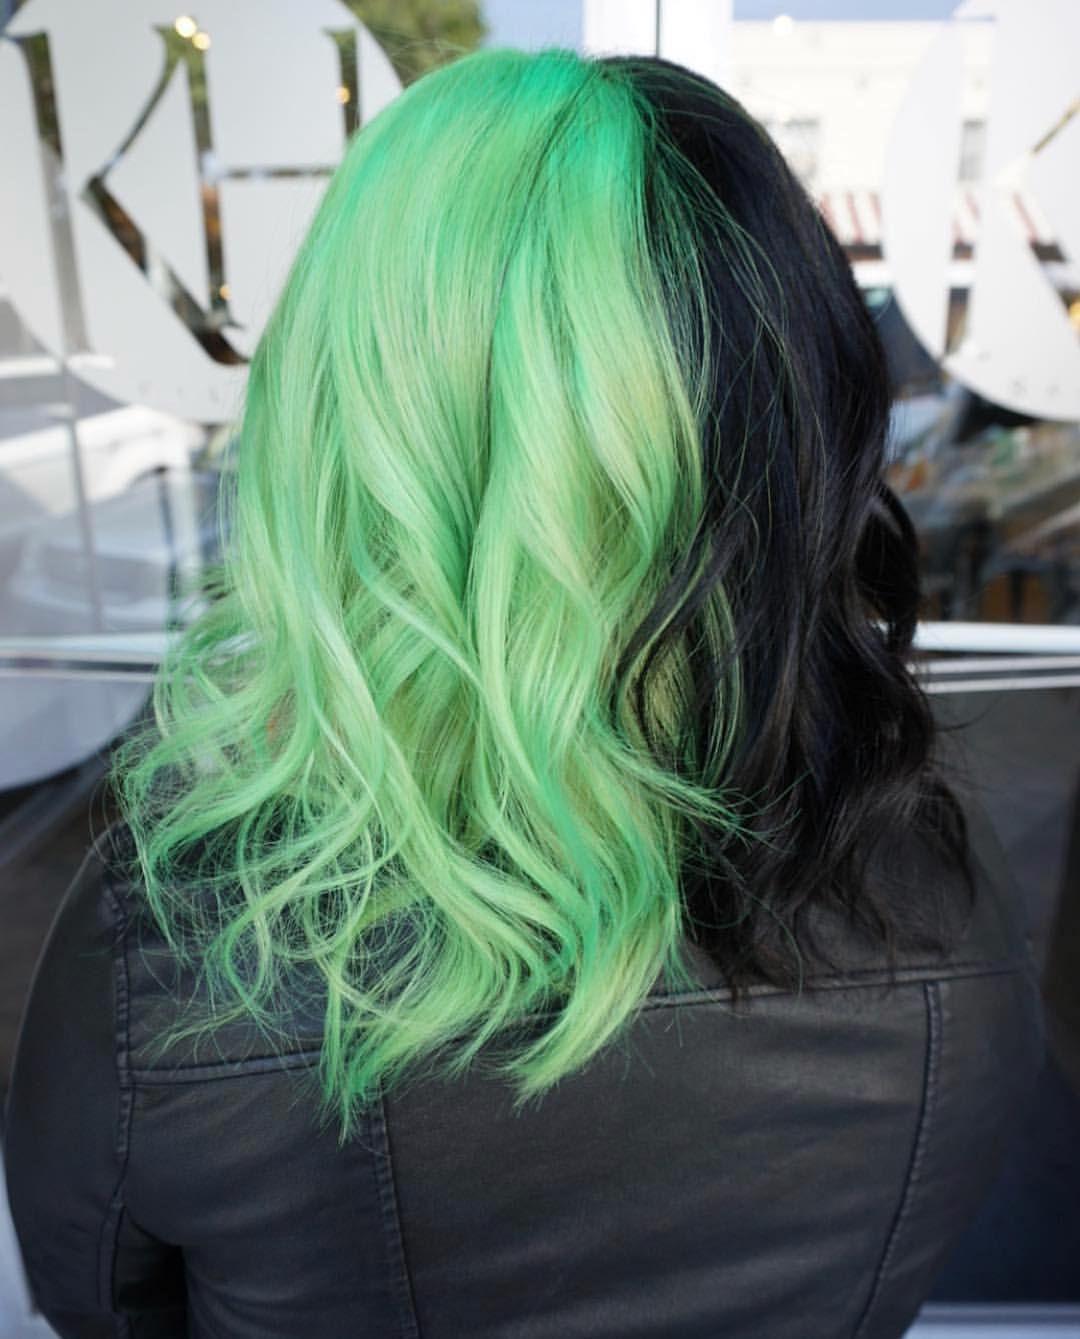 Half Neon Green Half Black Hair Hair By Jaylen Zanelli Jaylenzanelli On Instagram Jaylenzanelli Com Hair Styles Split Dyed Hair Green Hair